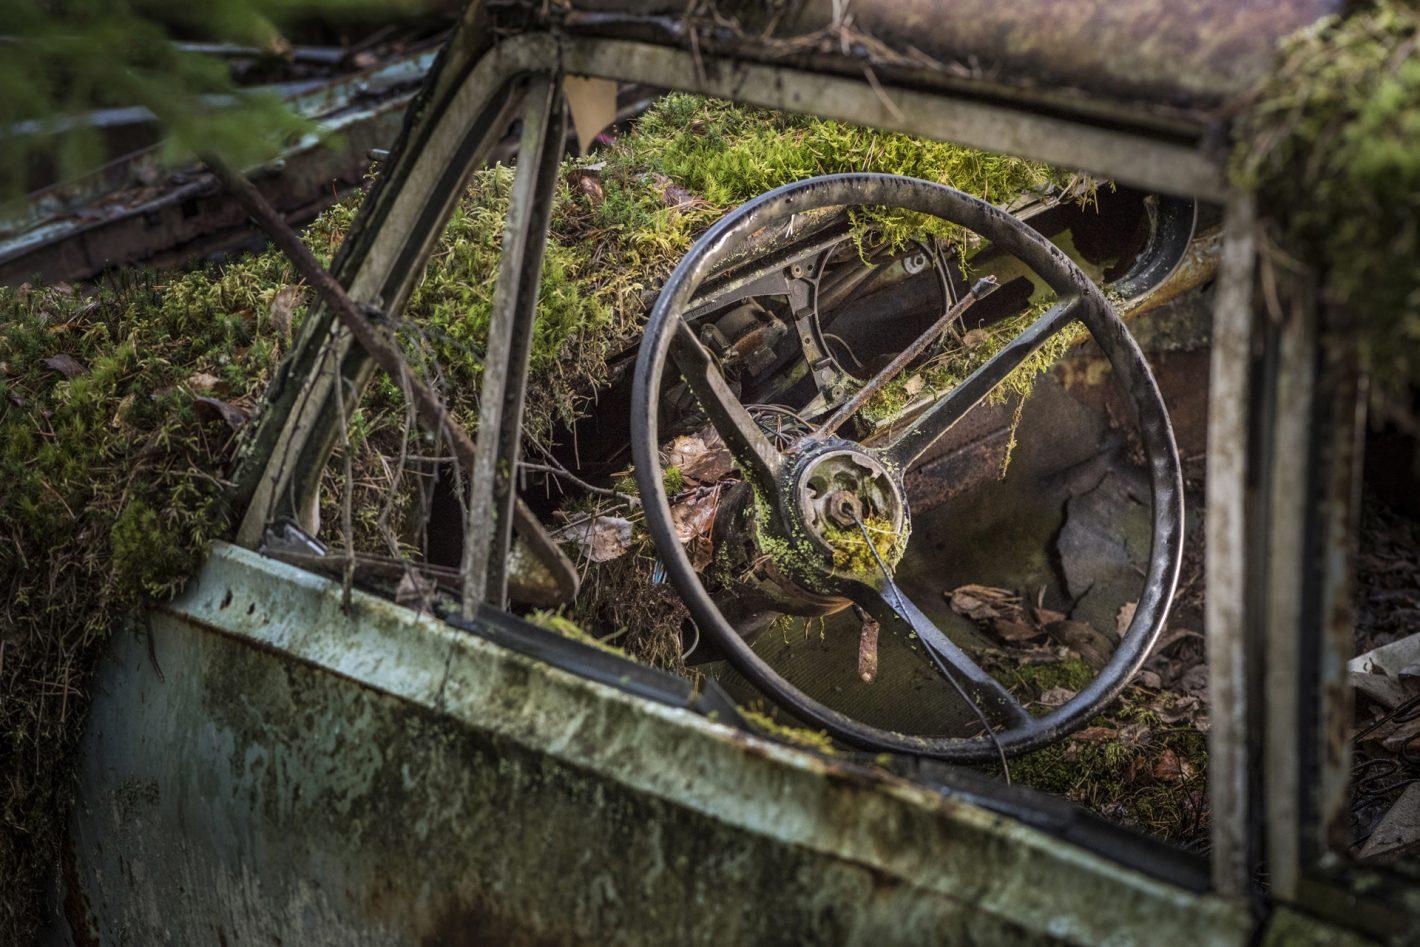 Alberto Ghizzi Panizza : Nikon D810, AF-S VR Micro-NIKKOR 105mm f/2.8G IF-ED